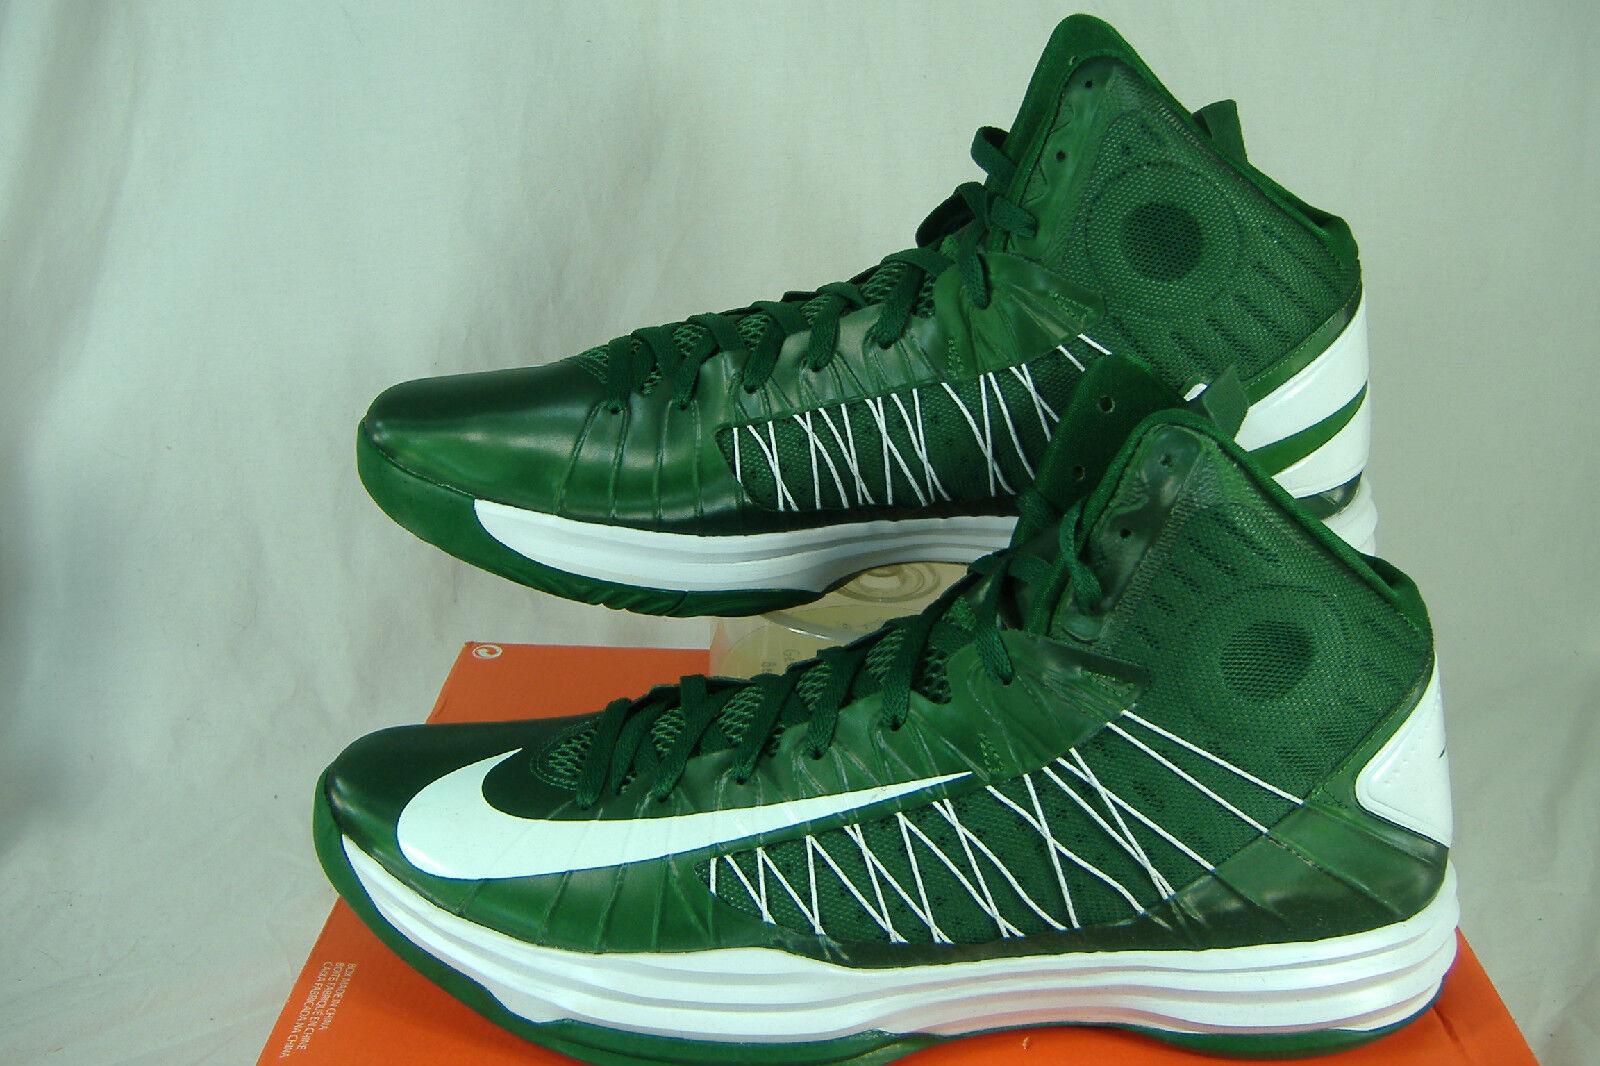 New Mens 16.5 NIKE Hyperdunk TB Green White High Top Shoes    524882-300